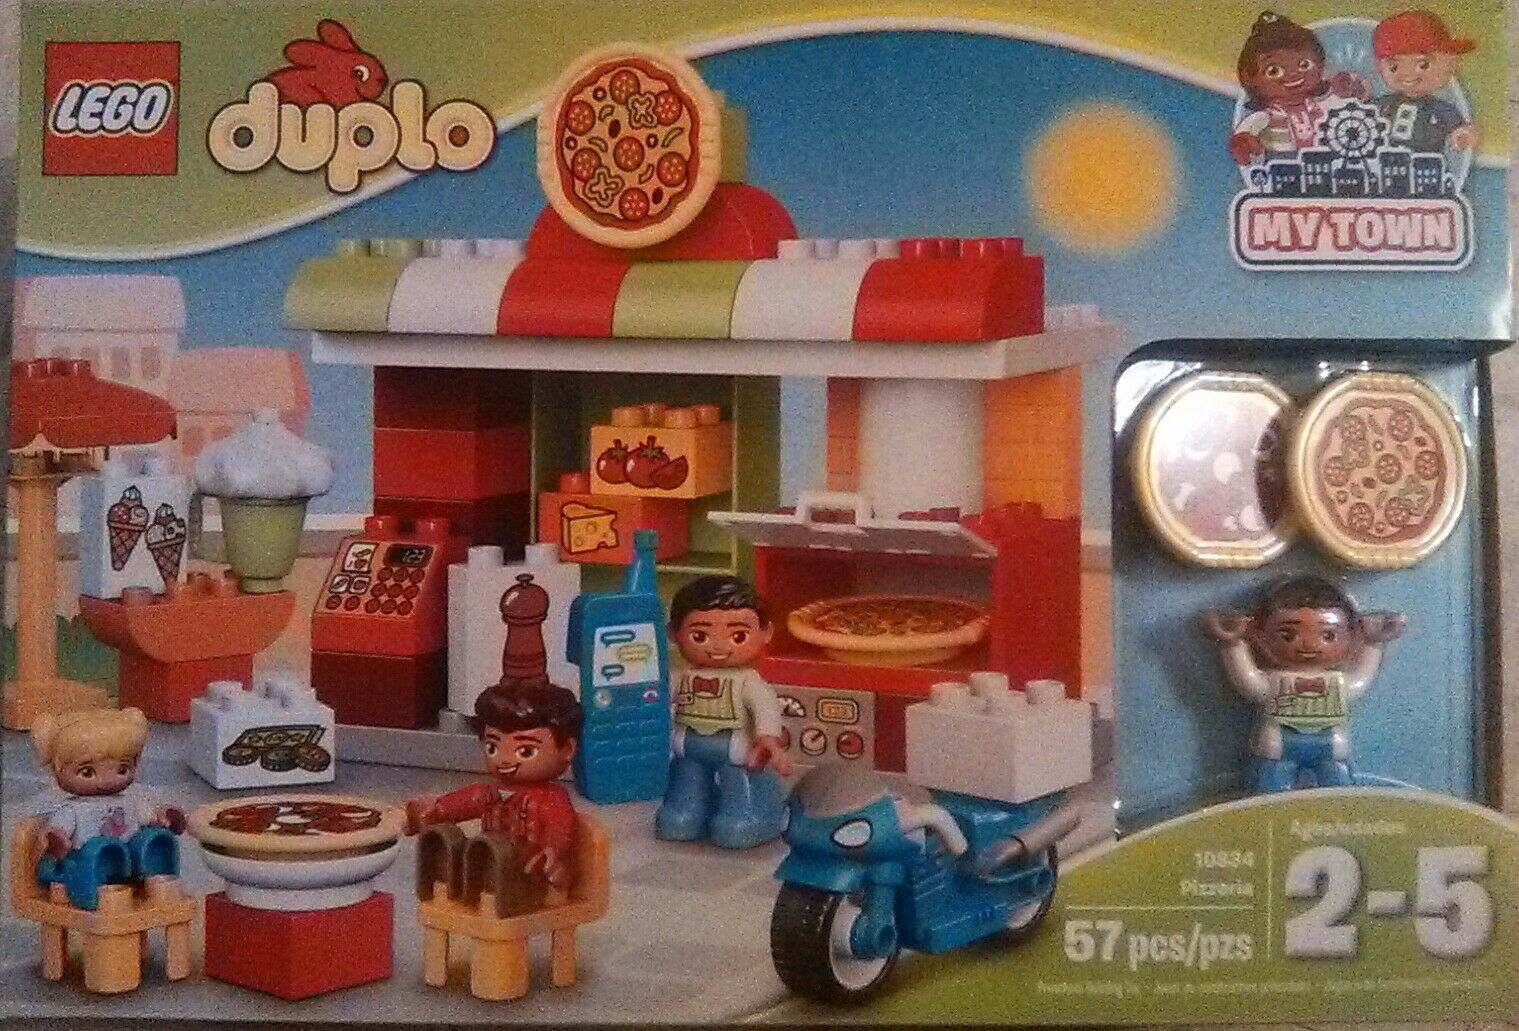 Brand New Lego Duplo Set Pizzeria 57 pieces 10834